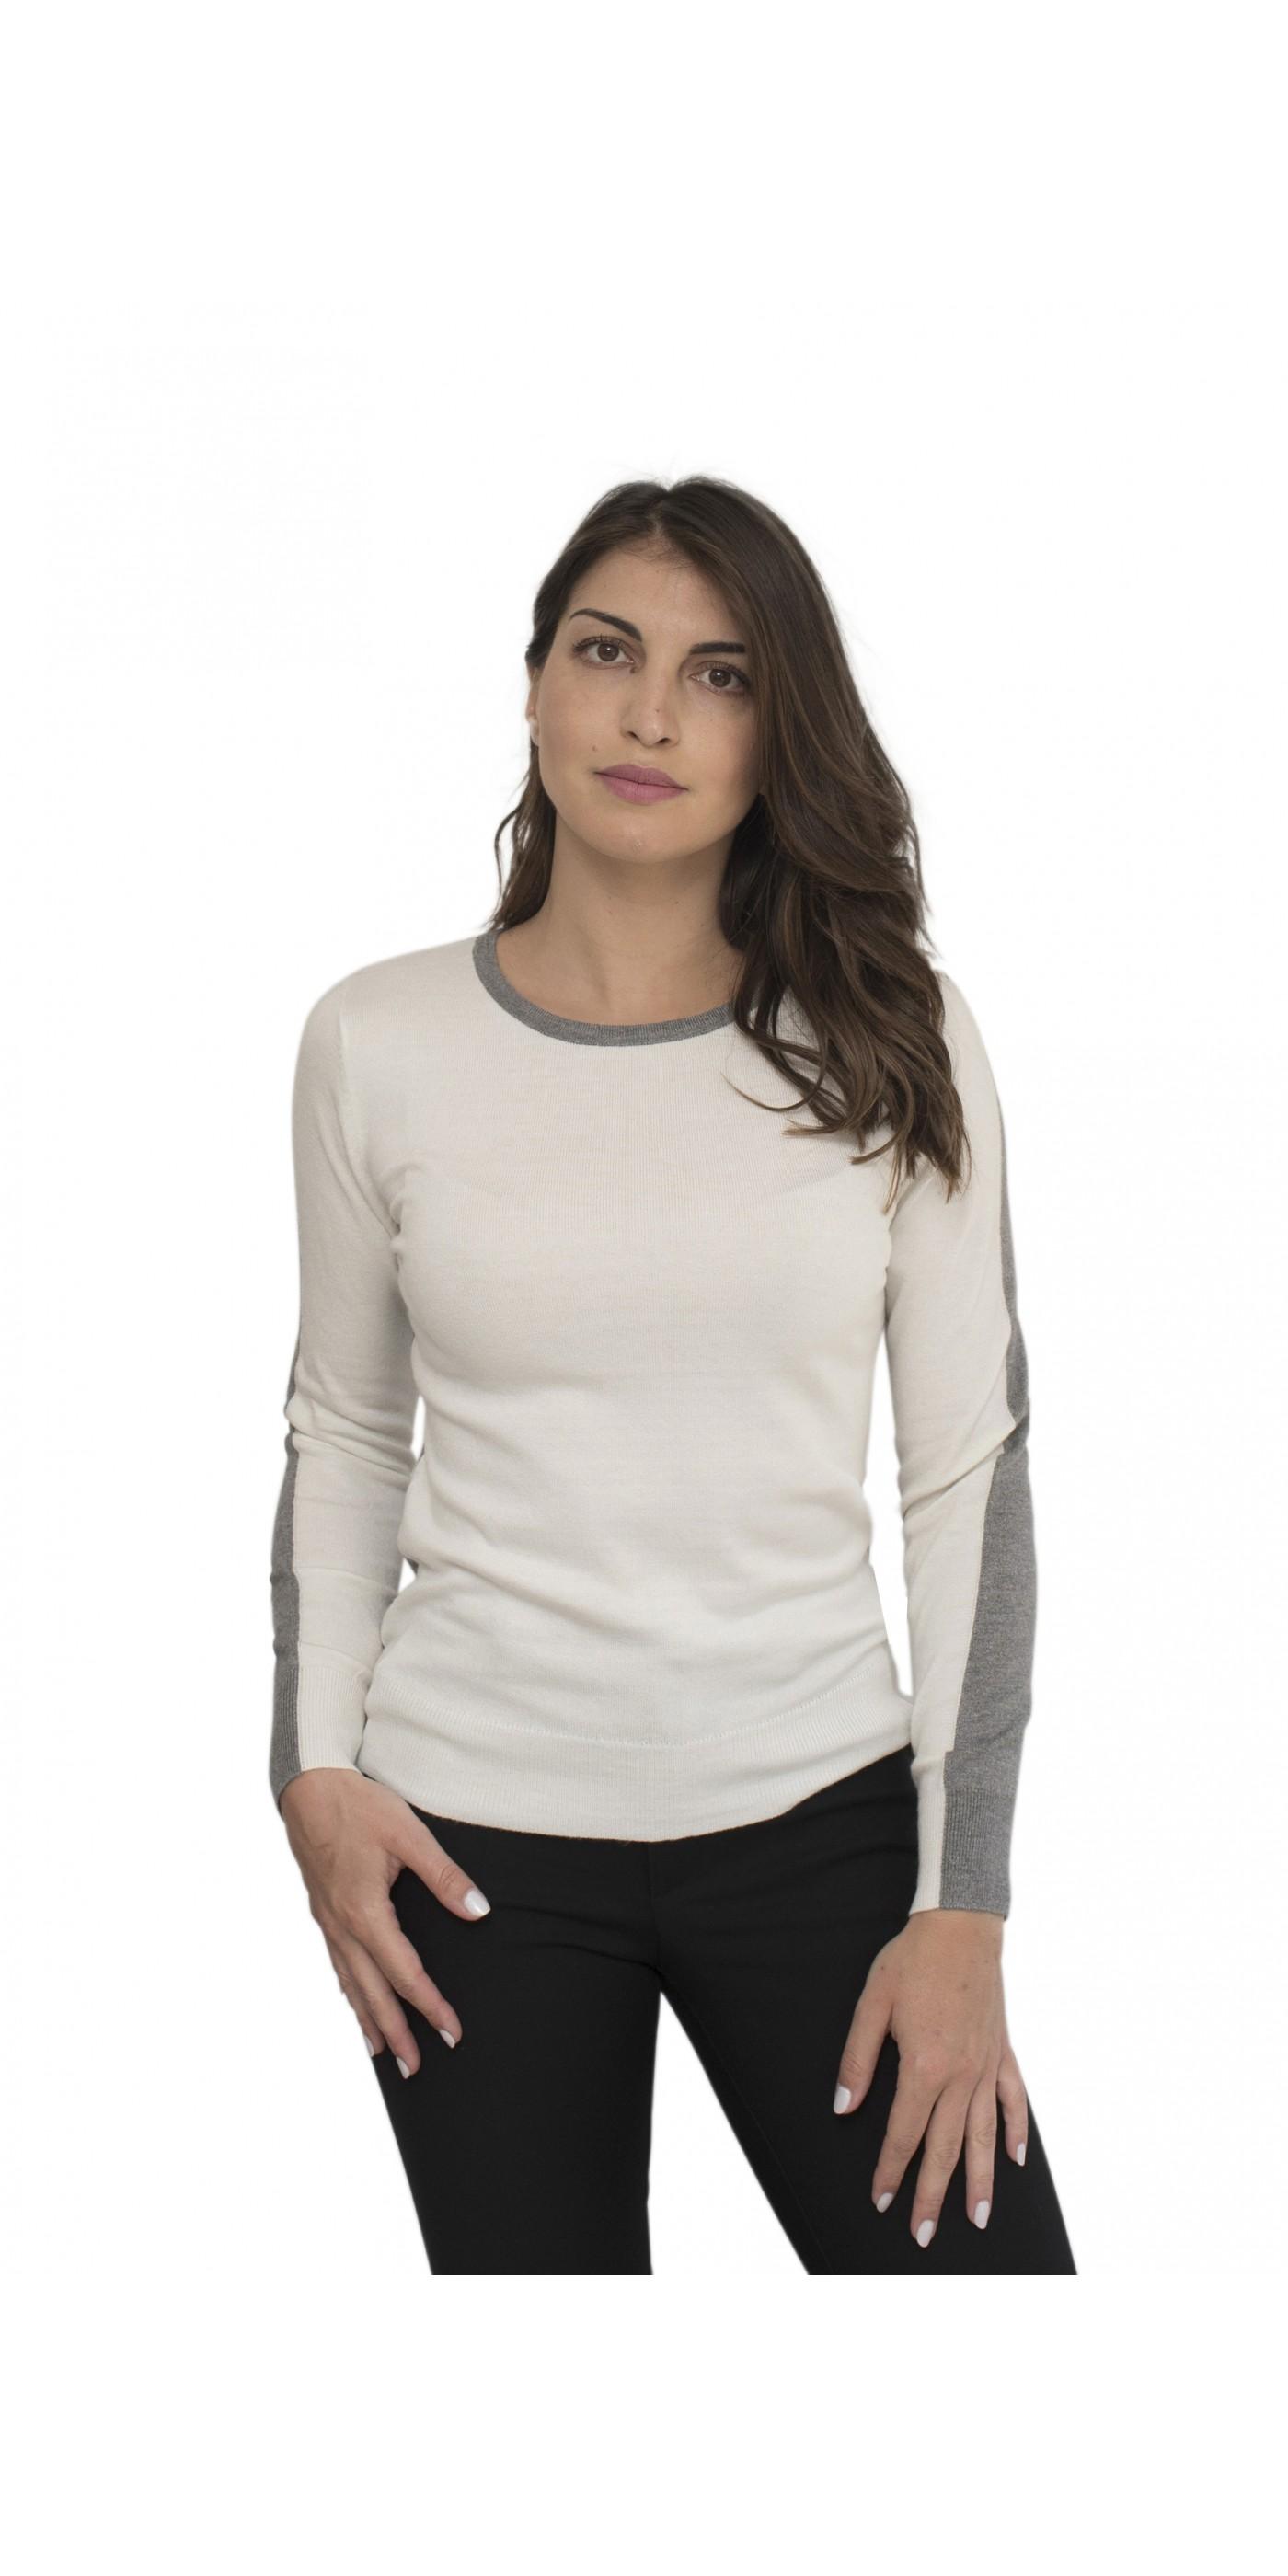 031e1b116ab2 Off white γυναικεία μπλούζα με γκρι στο μανίκι και στην λαιμόκοψη. Loading  zoom